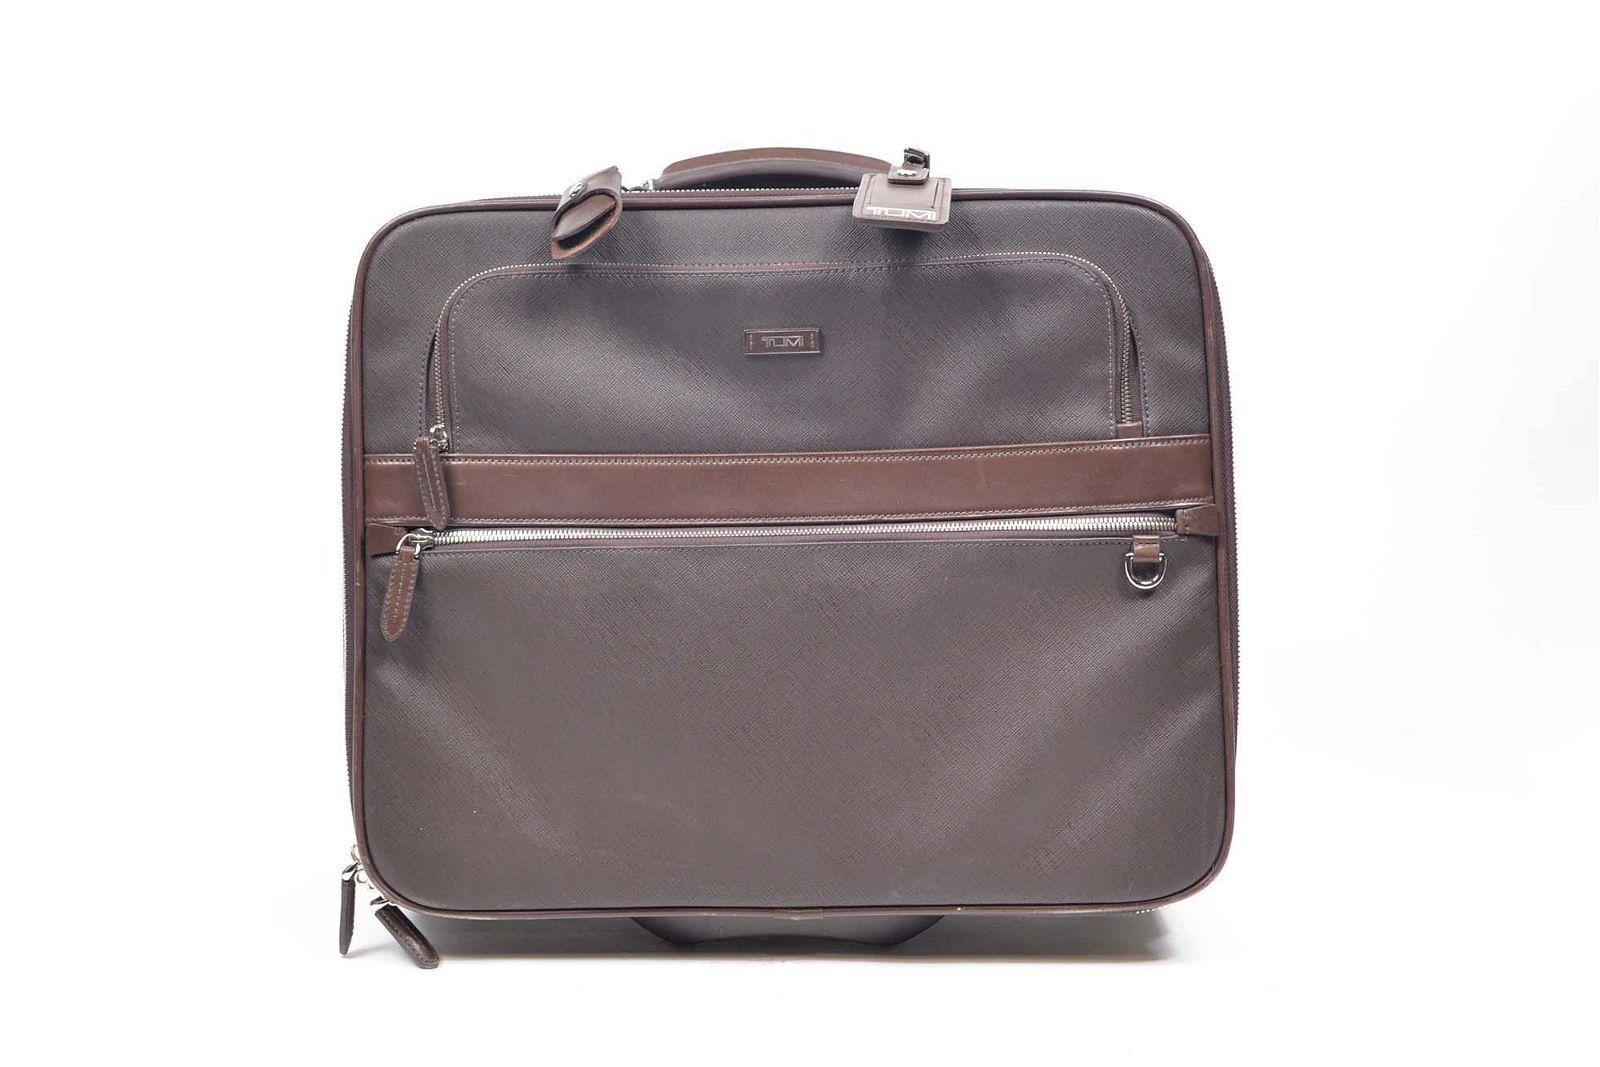 Tumi - Travel bag